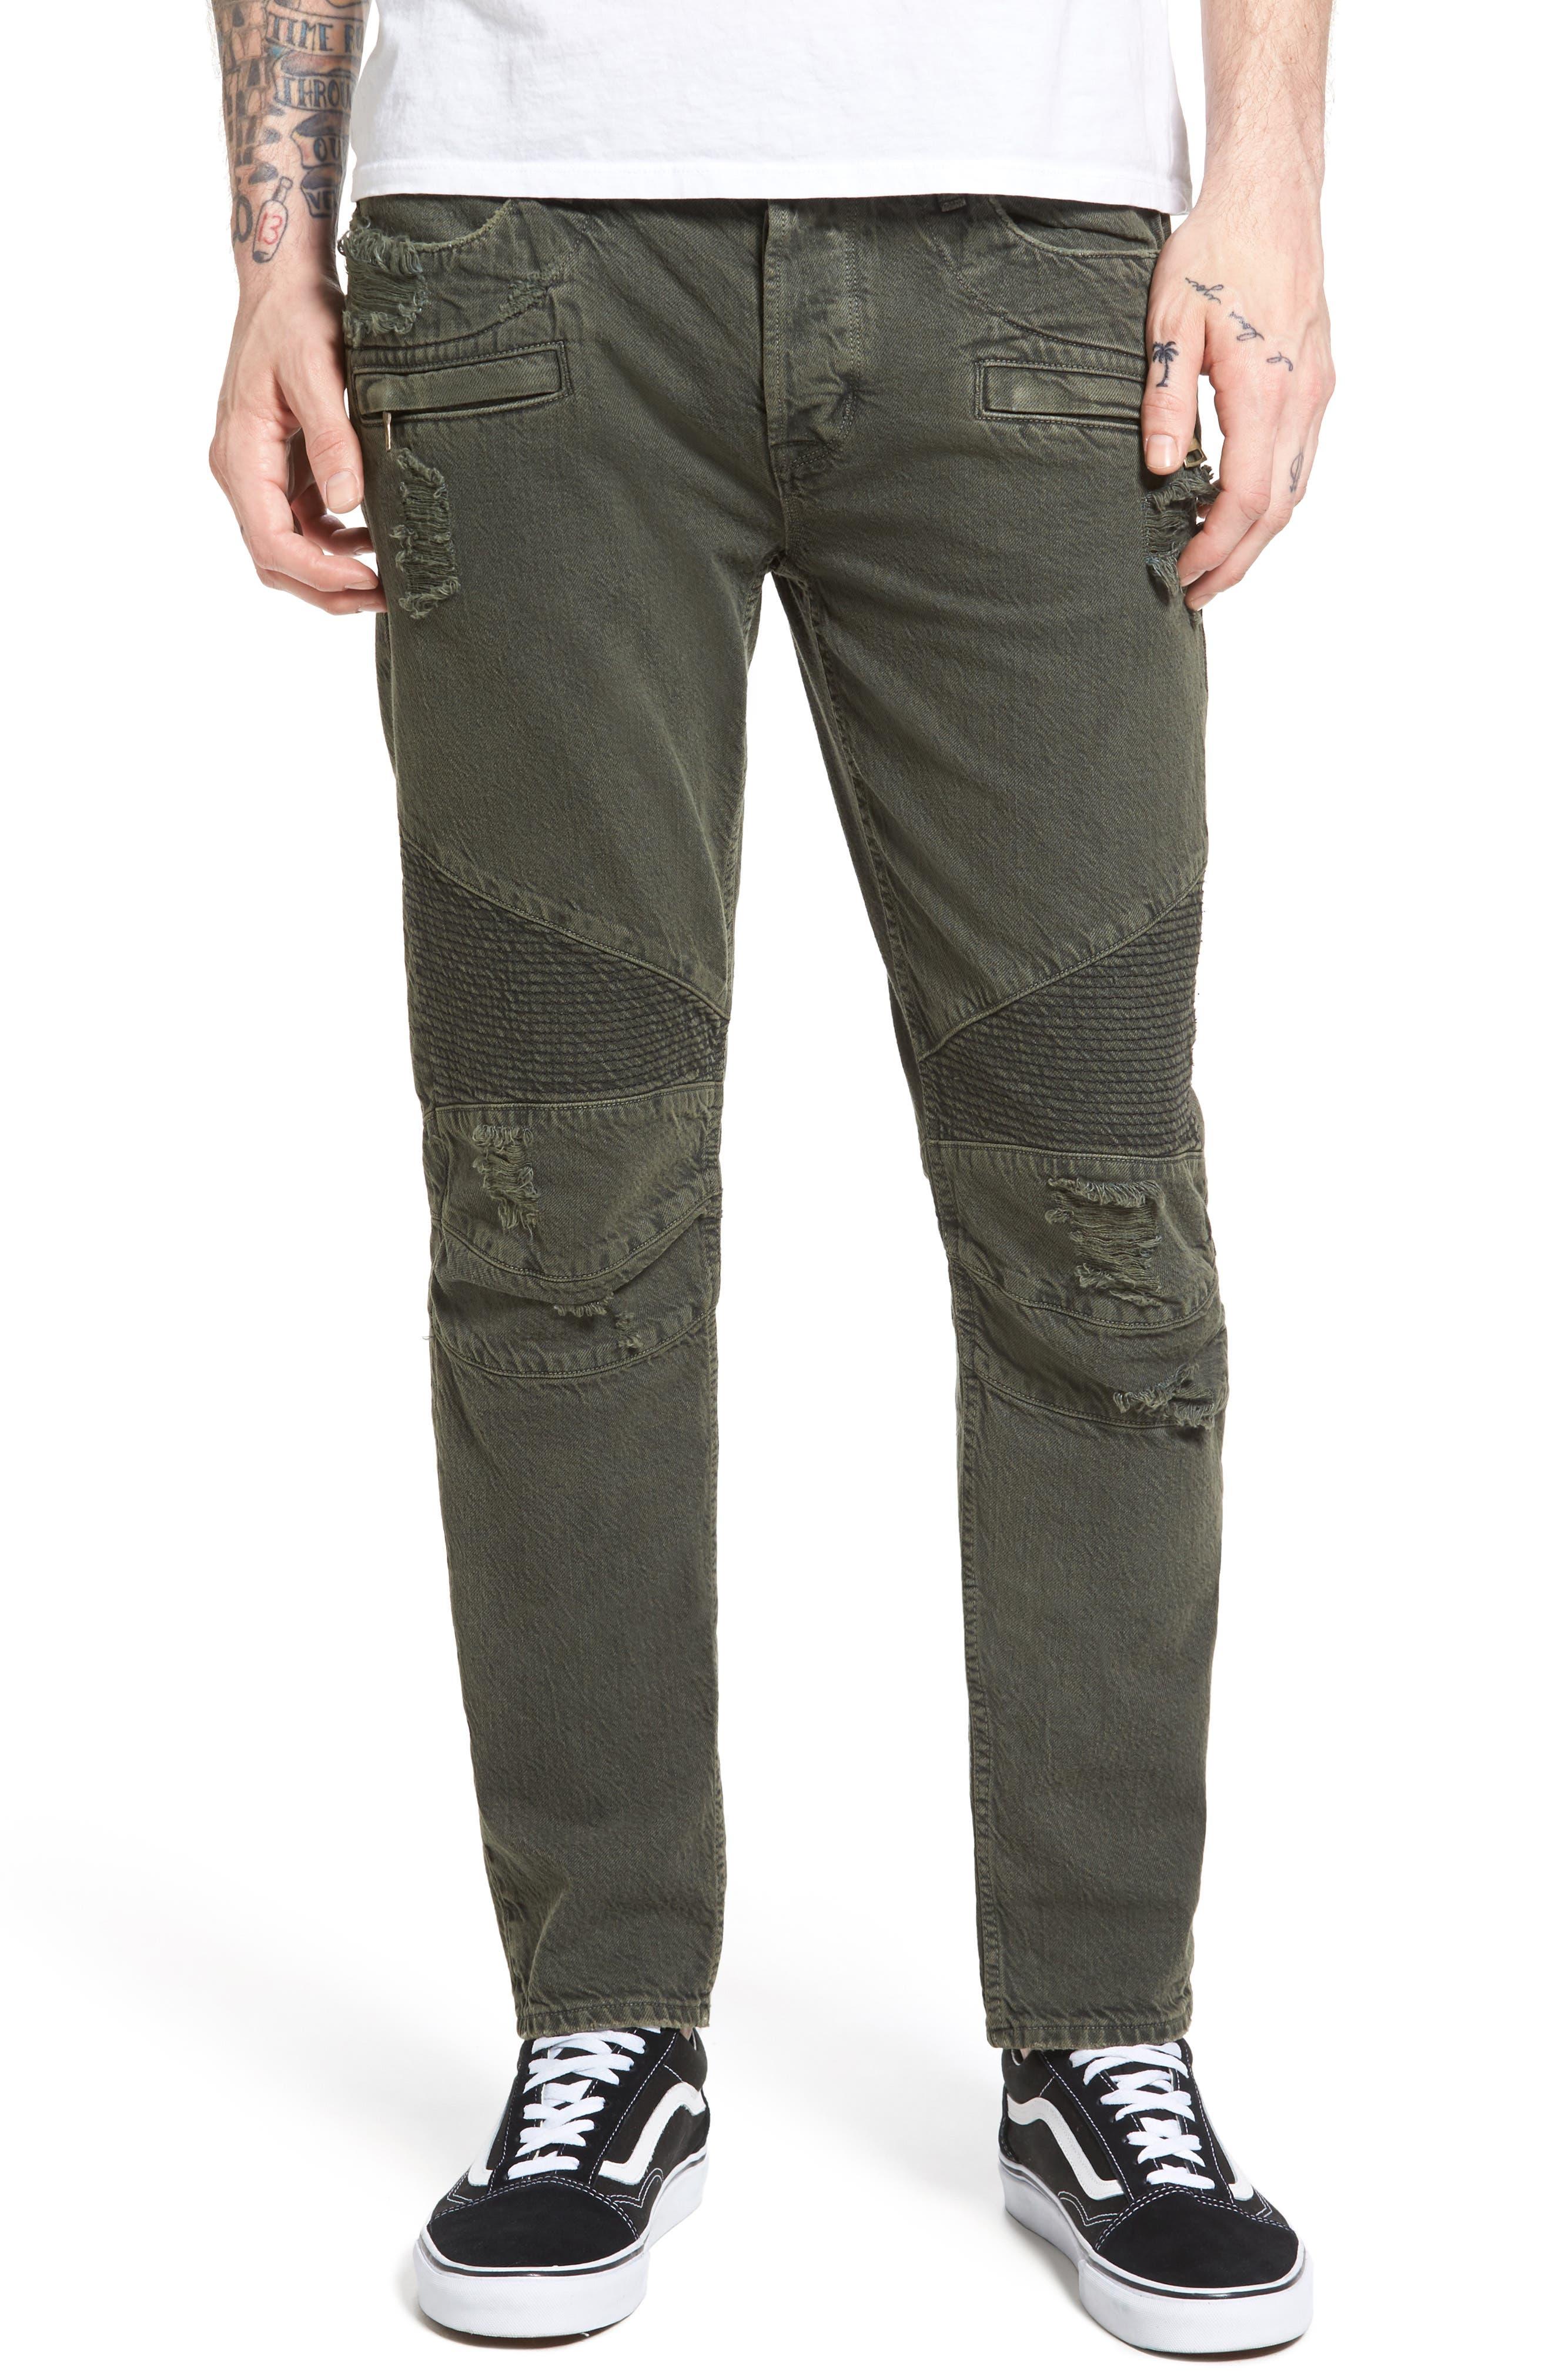 Blinder Biker Skinny Fit Jeans,                         Main,                         color, Fortitude Green